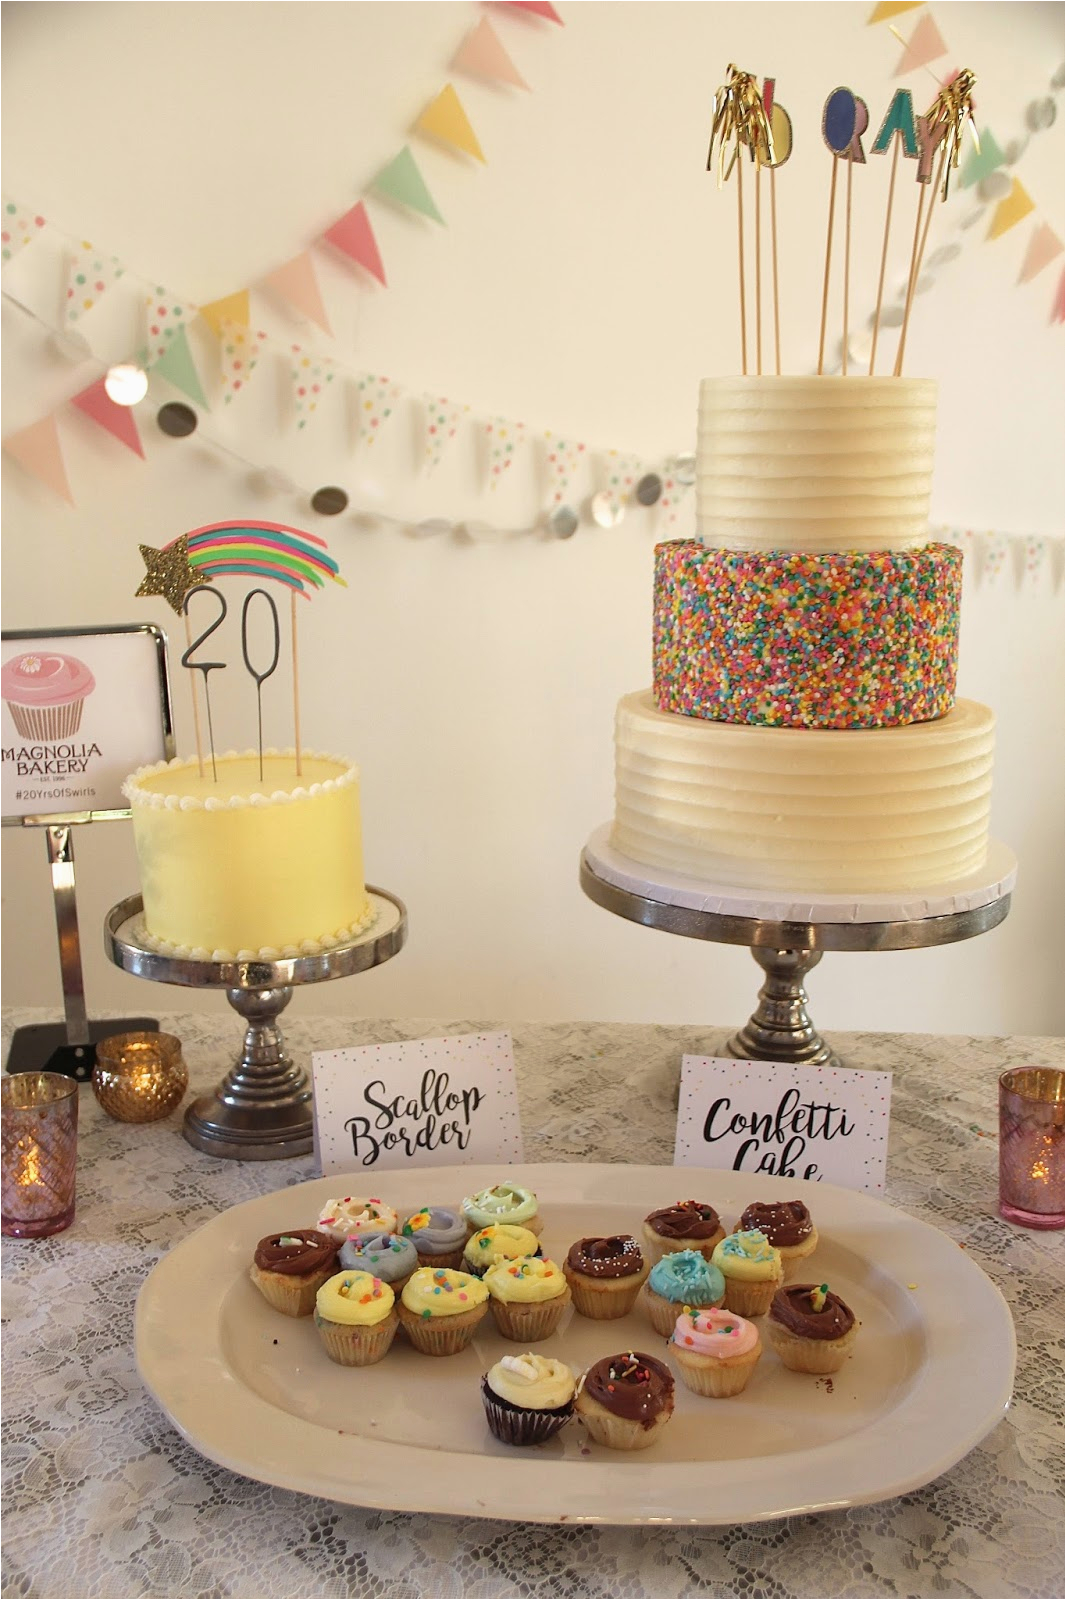 20th Birthday Decorations Fashionably Petite Magnolia Bakery Party